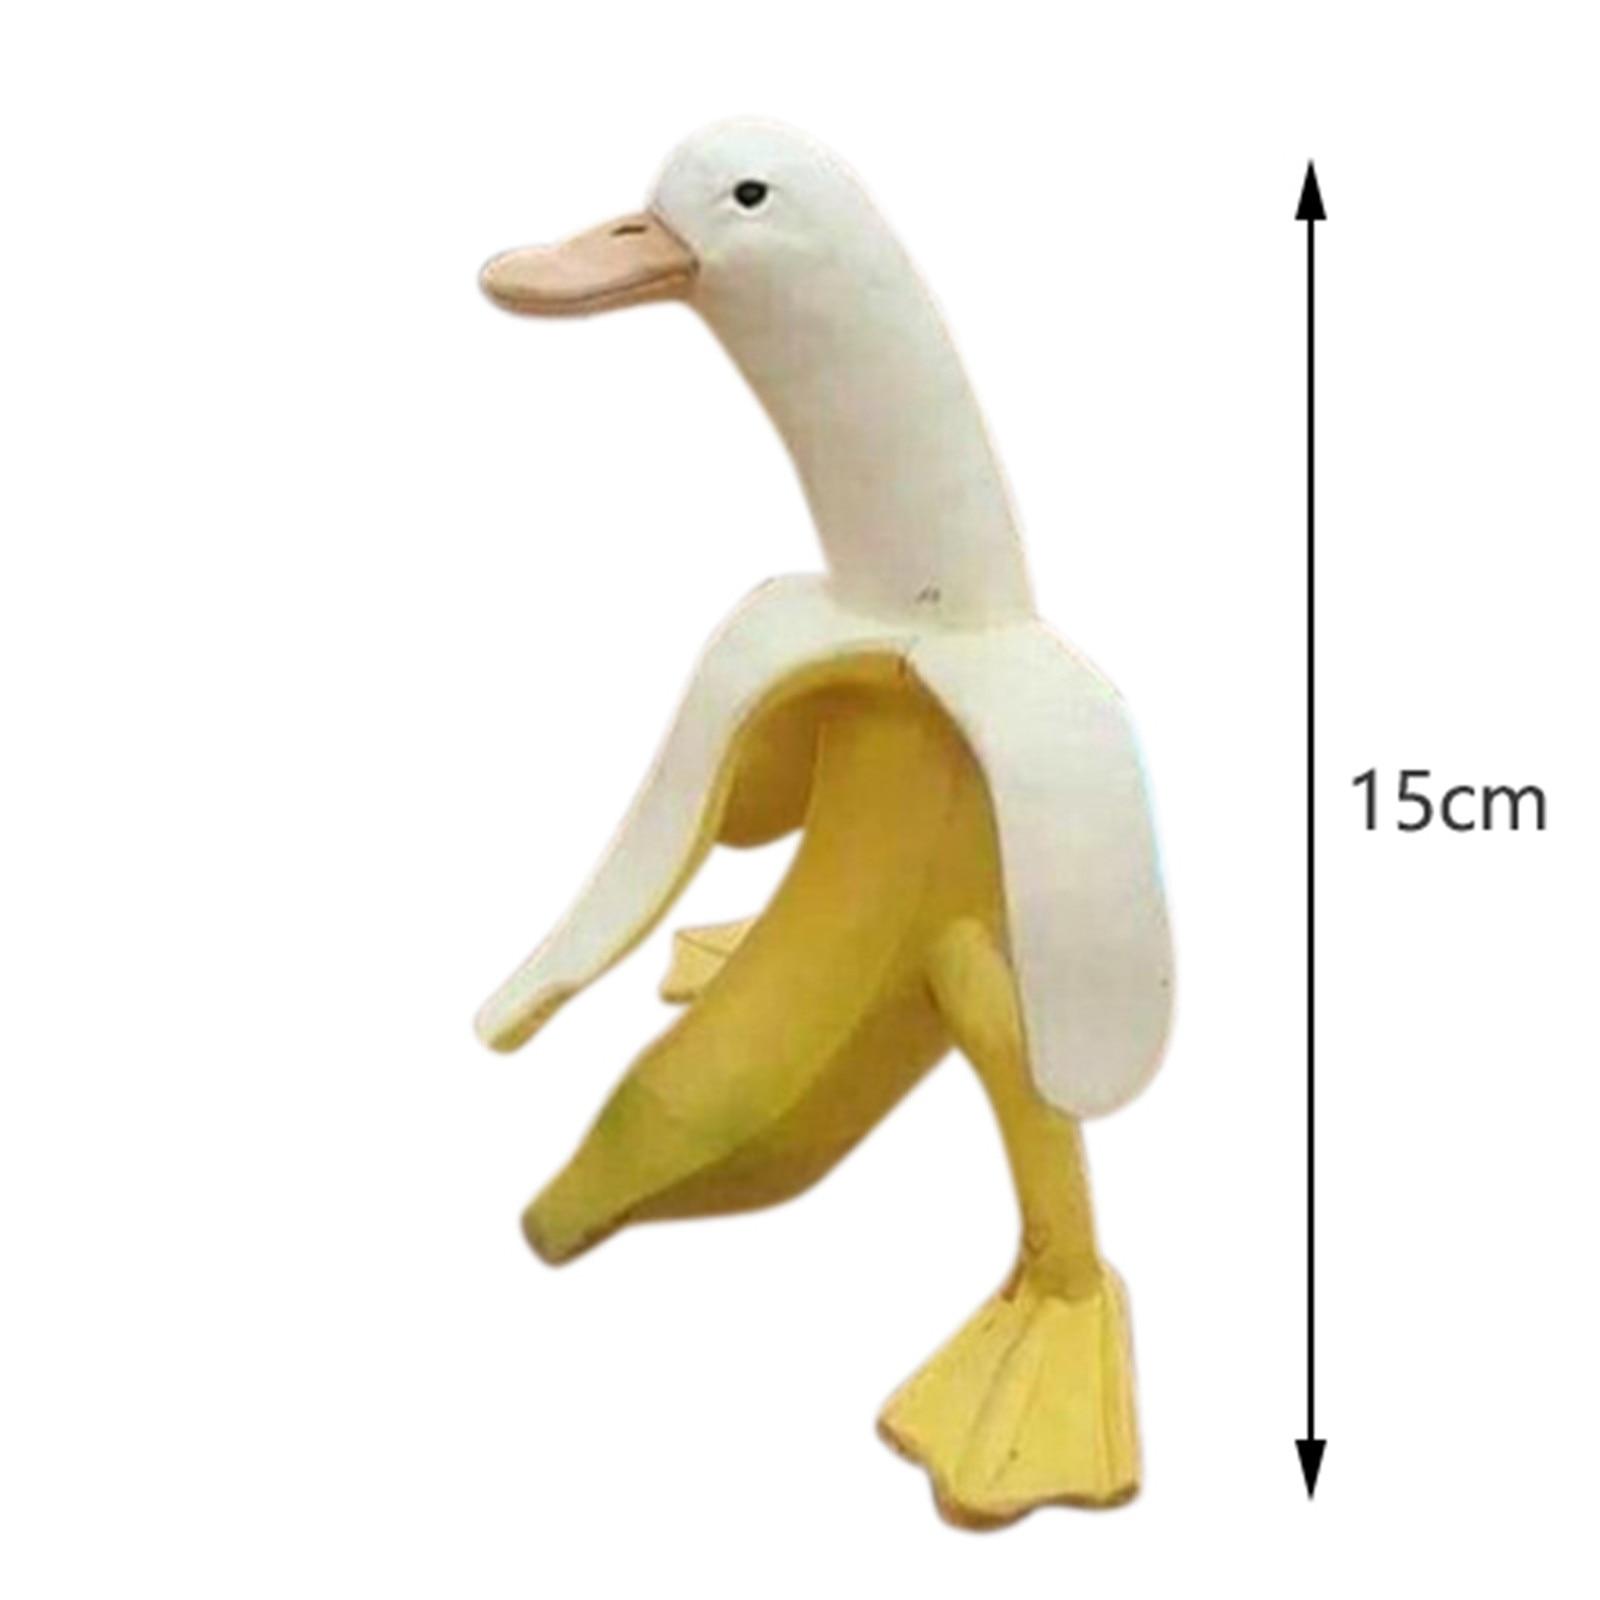 Weird Resin Hybrid Banana Duck Statue Garden lawn ornament Freaky Fruit Duck Non Rubbish Banana Sitter Sculpture